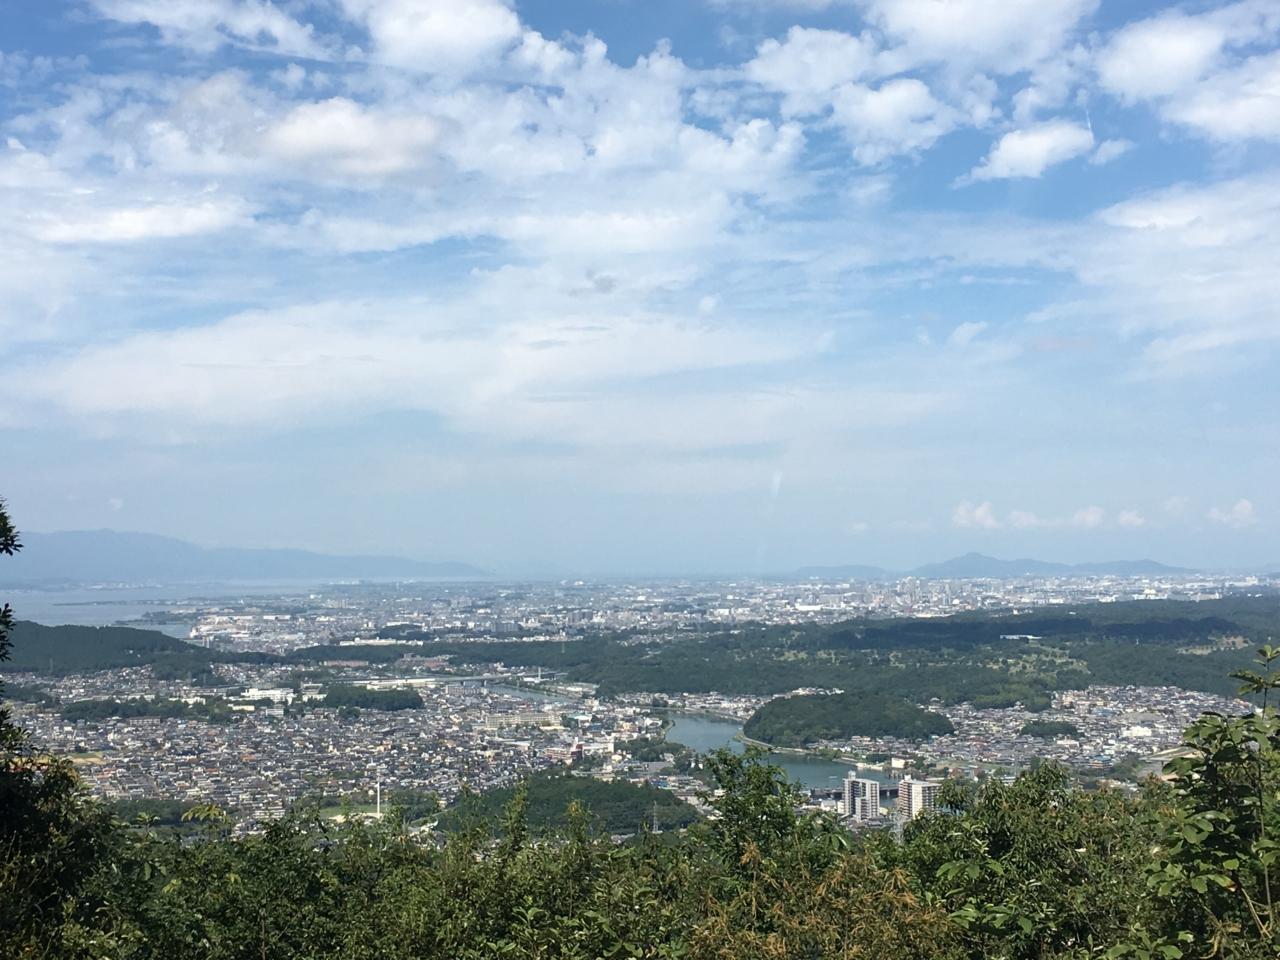 f:id:takatakamanbou:20160910164527j:plain